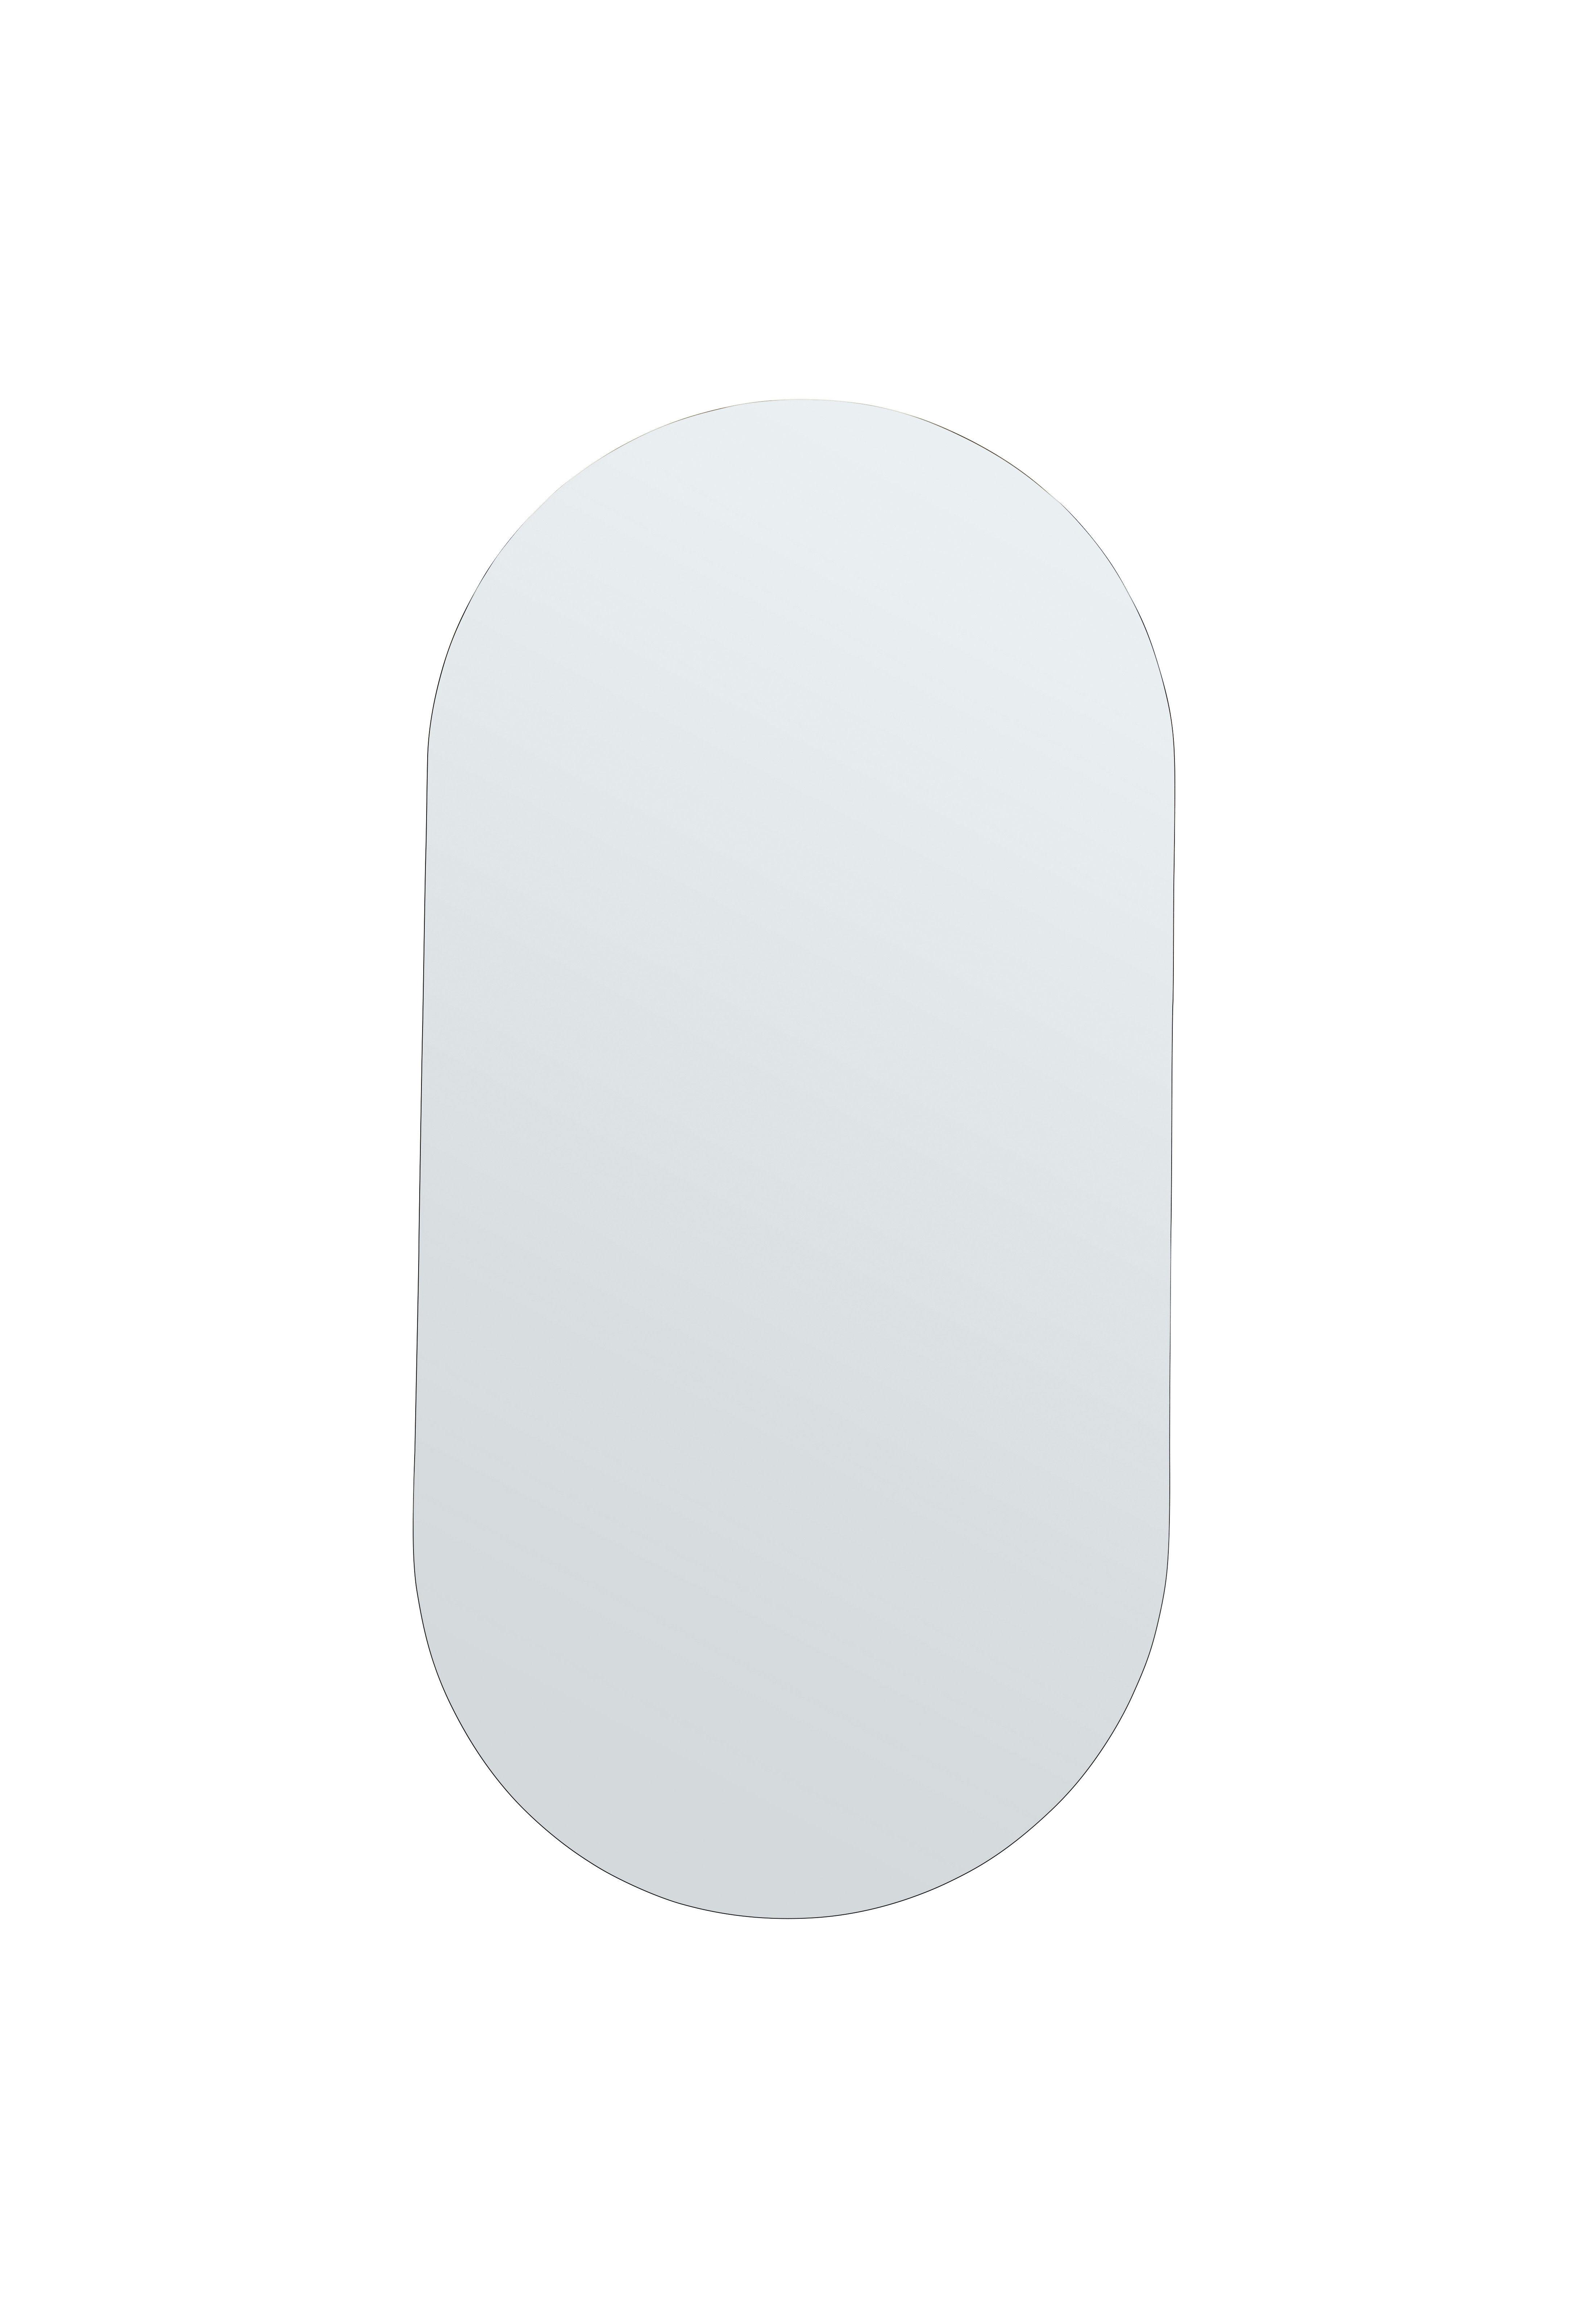 Déco - Miroirs - Miroir mural Walls Medium / L 50 x H 100 cm - House Doctor - 50 x 100 cm - Fer, MDF, Verre